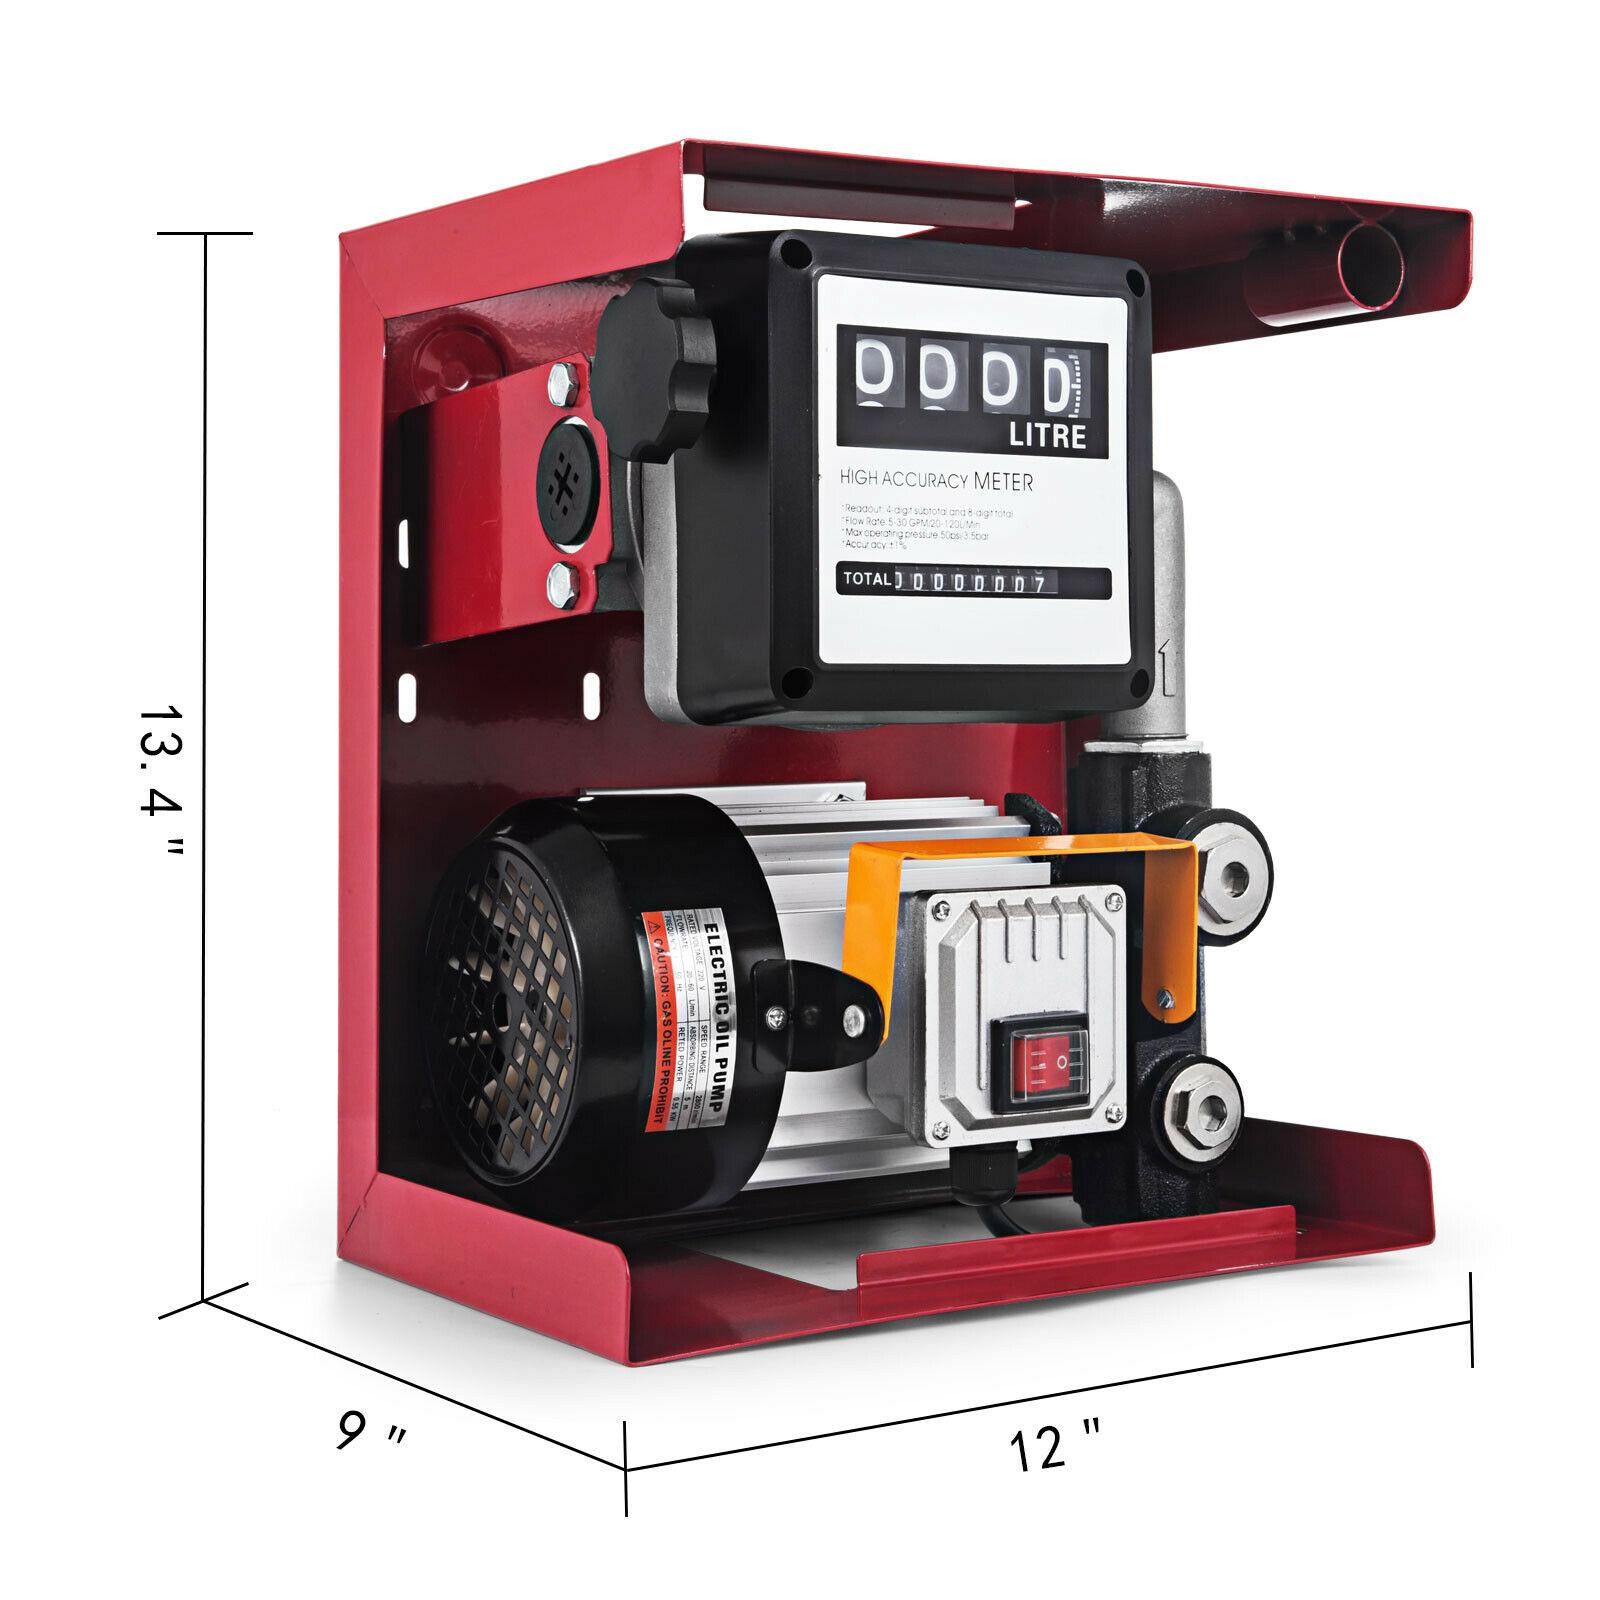 230V 550W Fuel Pump With Fuel Meter Induction Engine Diesel 2800R / M